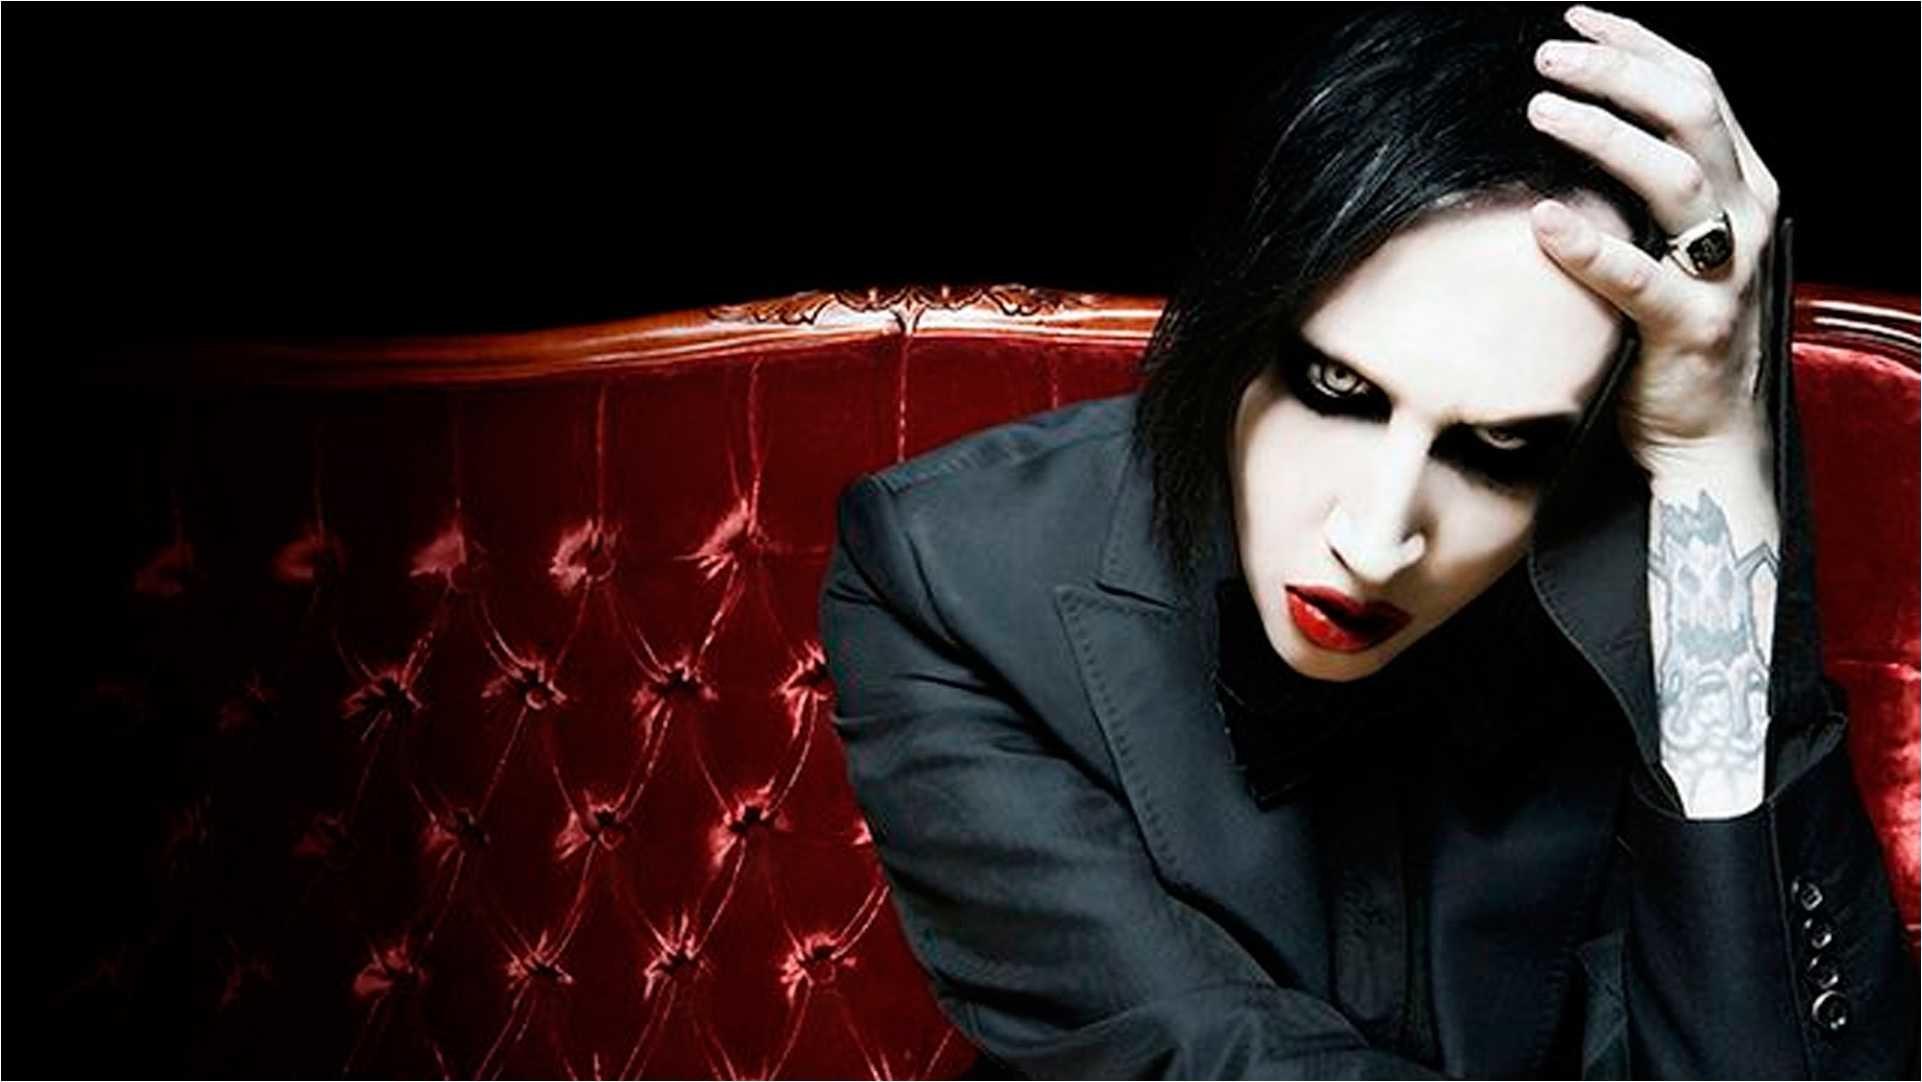 Marilyn Manson Backgrounds